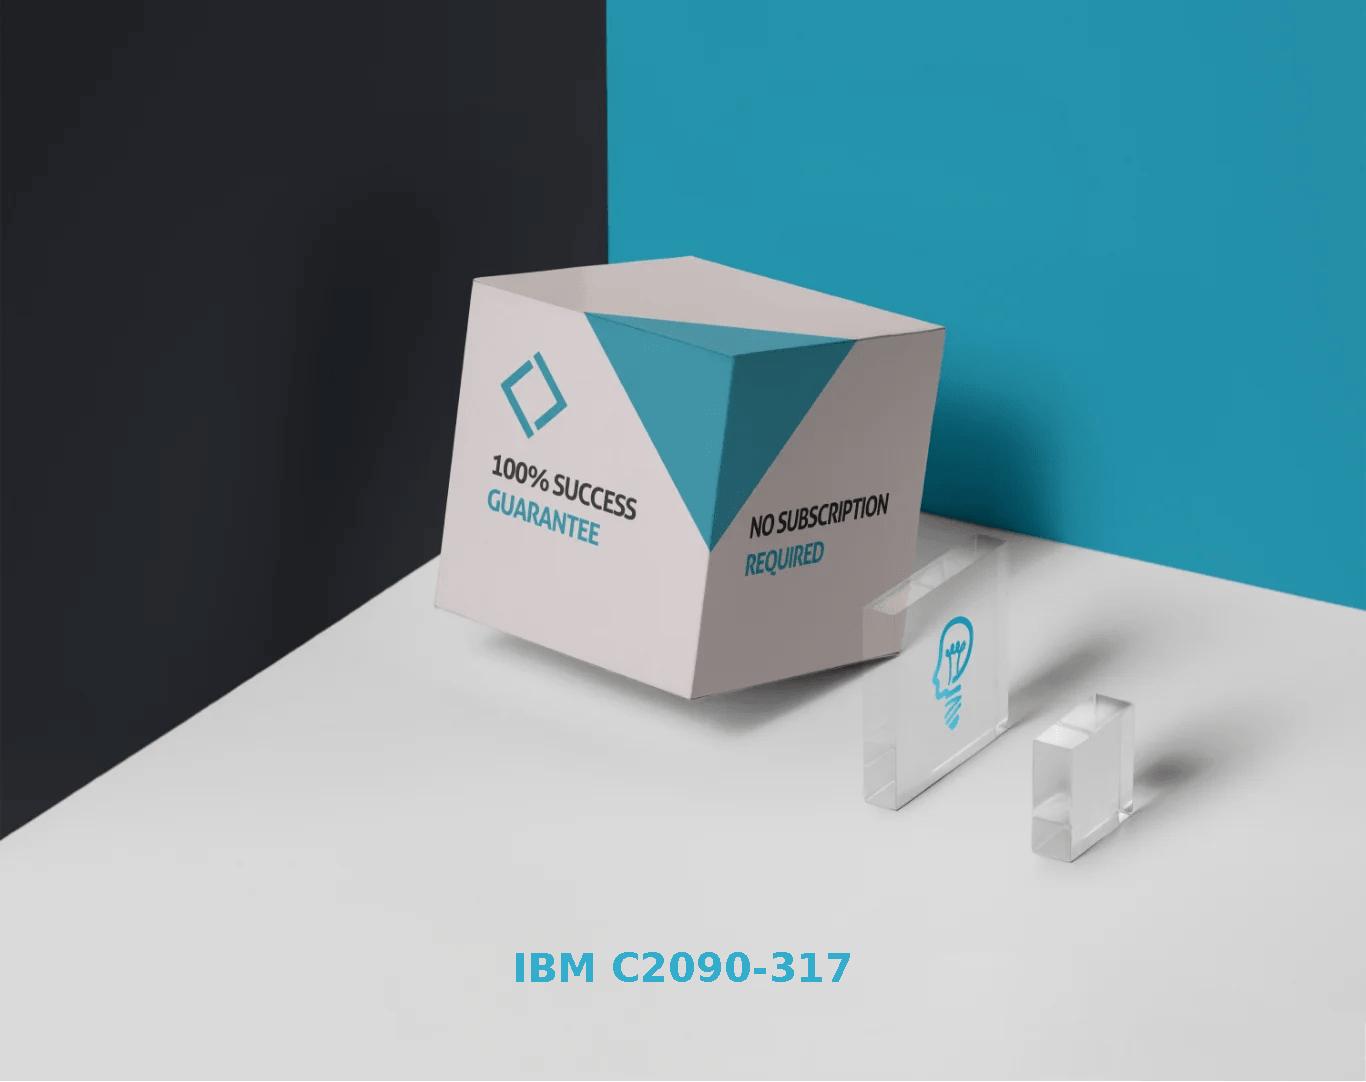 IBM C2090-317 Exams